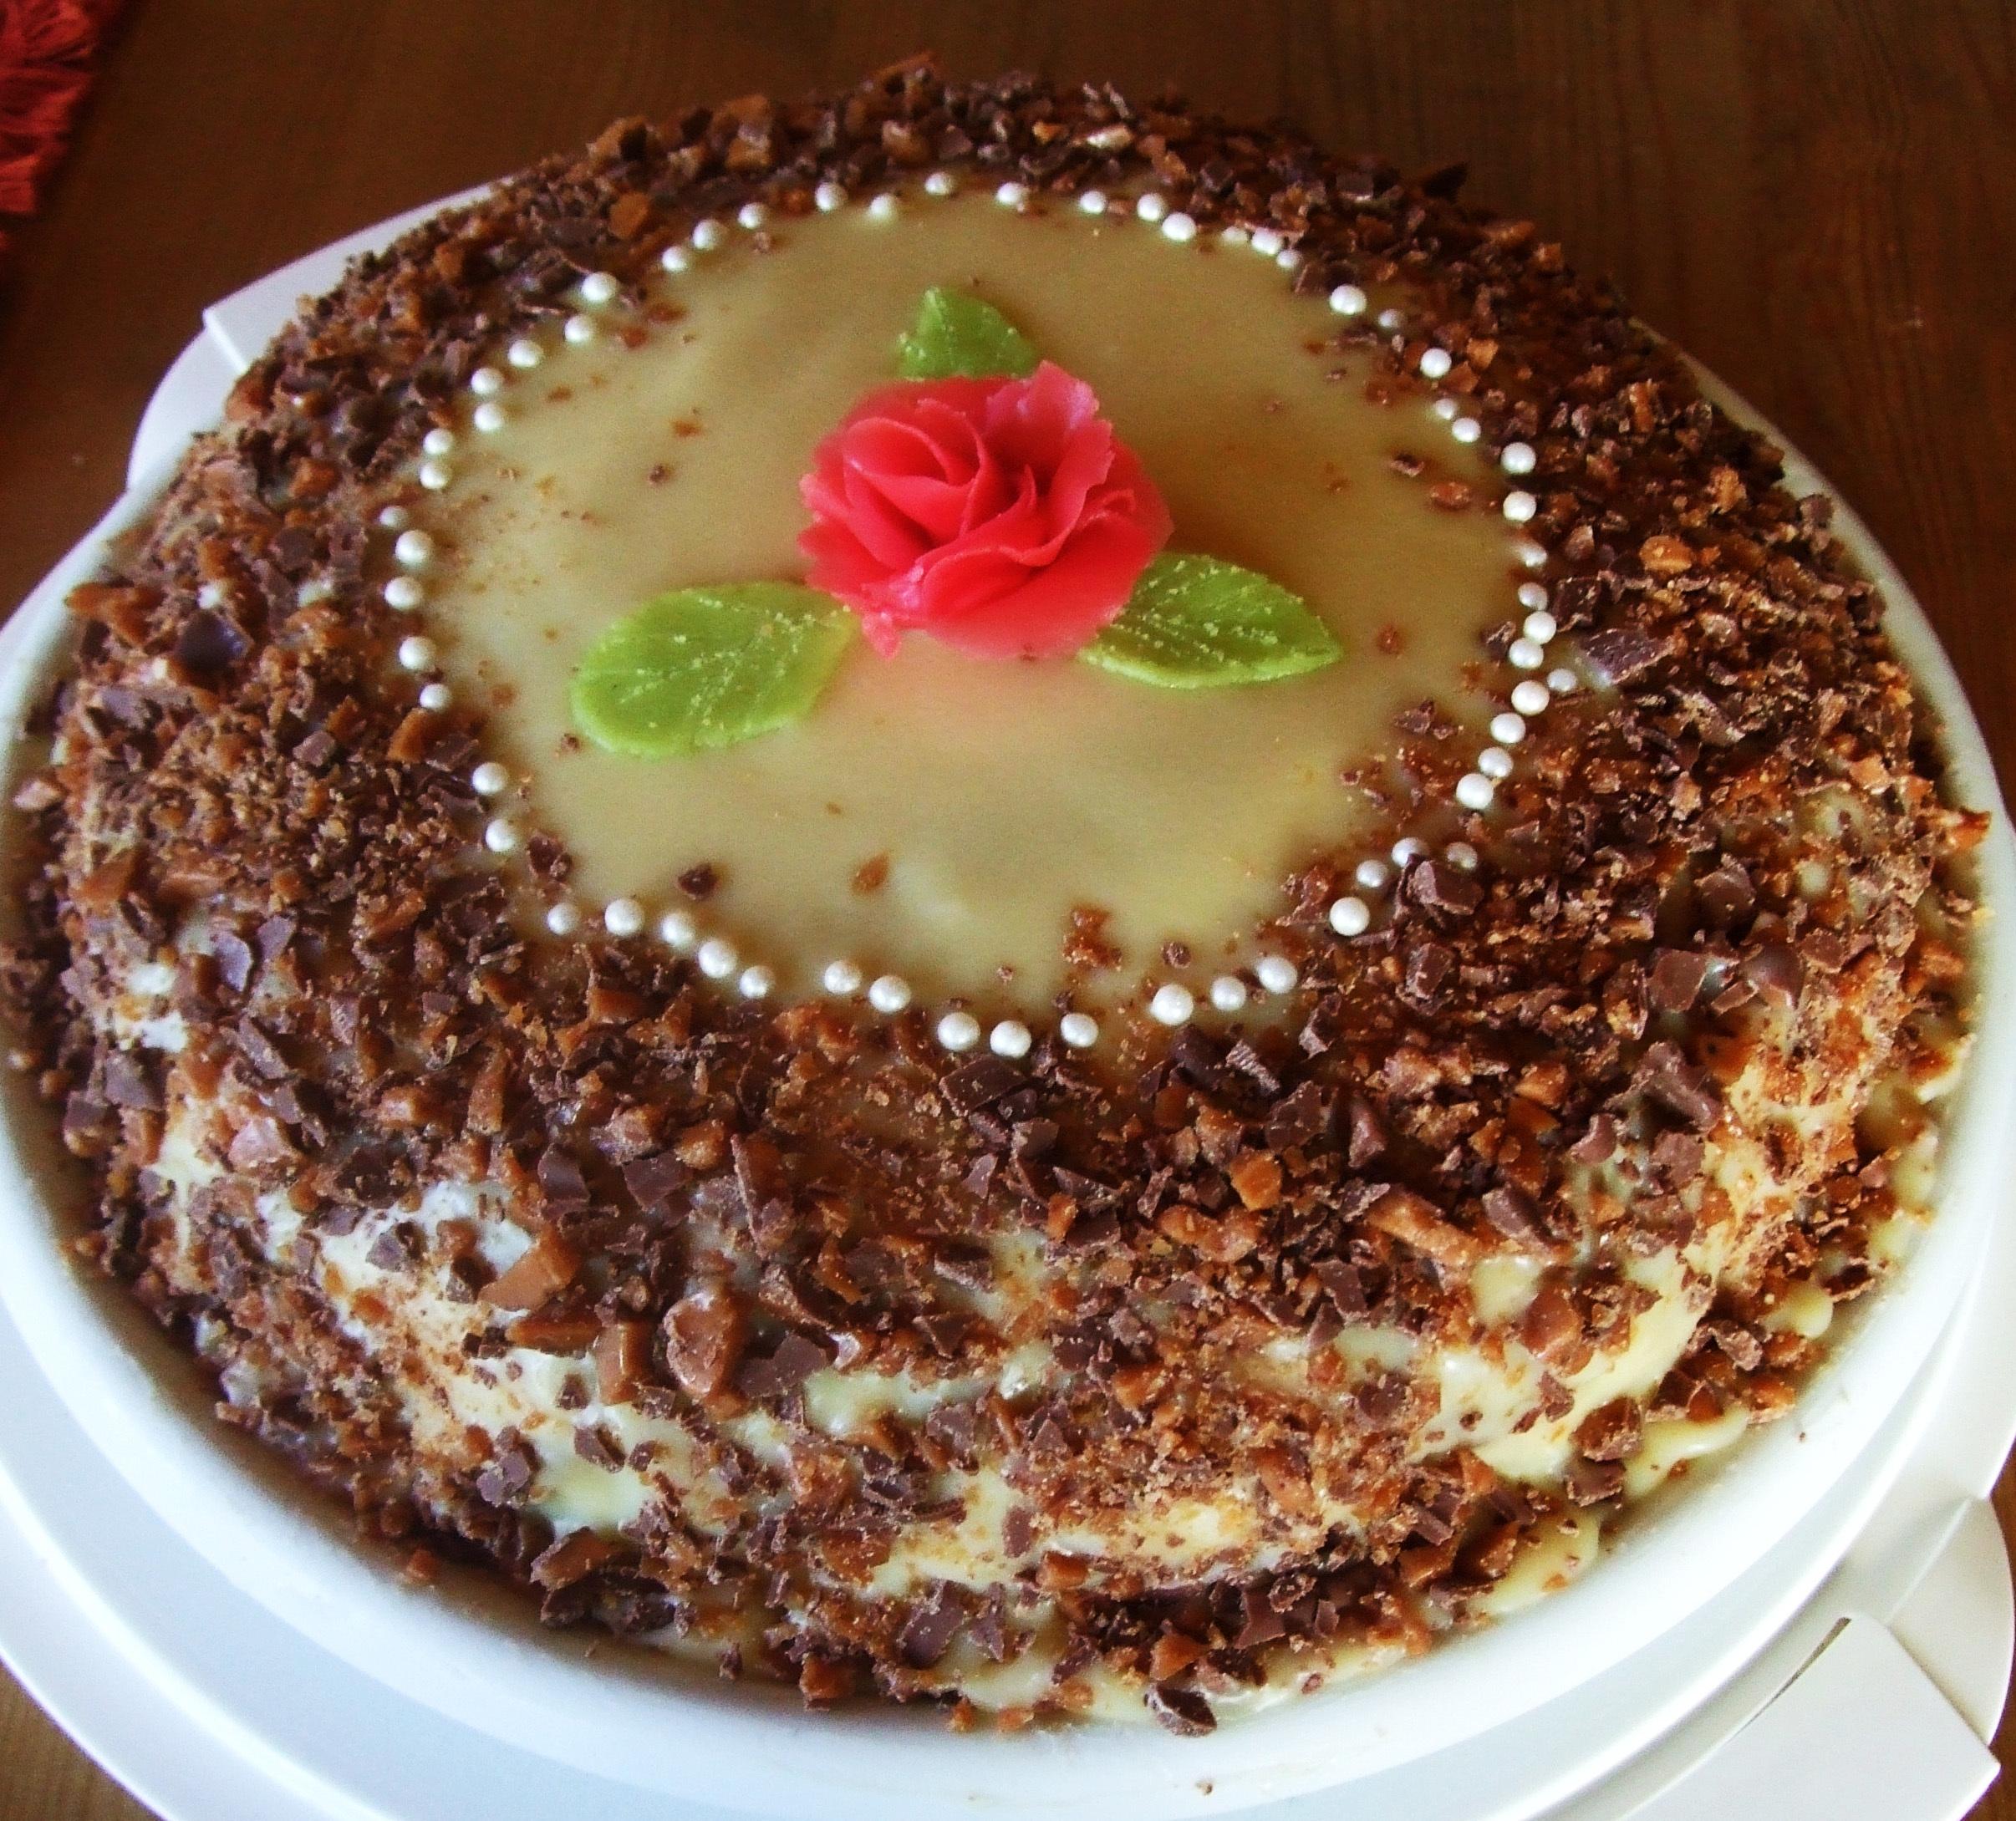 Chokladtårta med vitchoklad